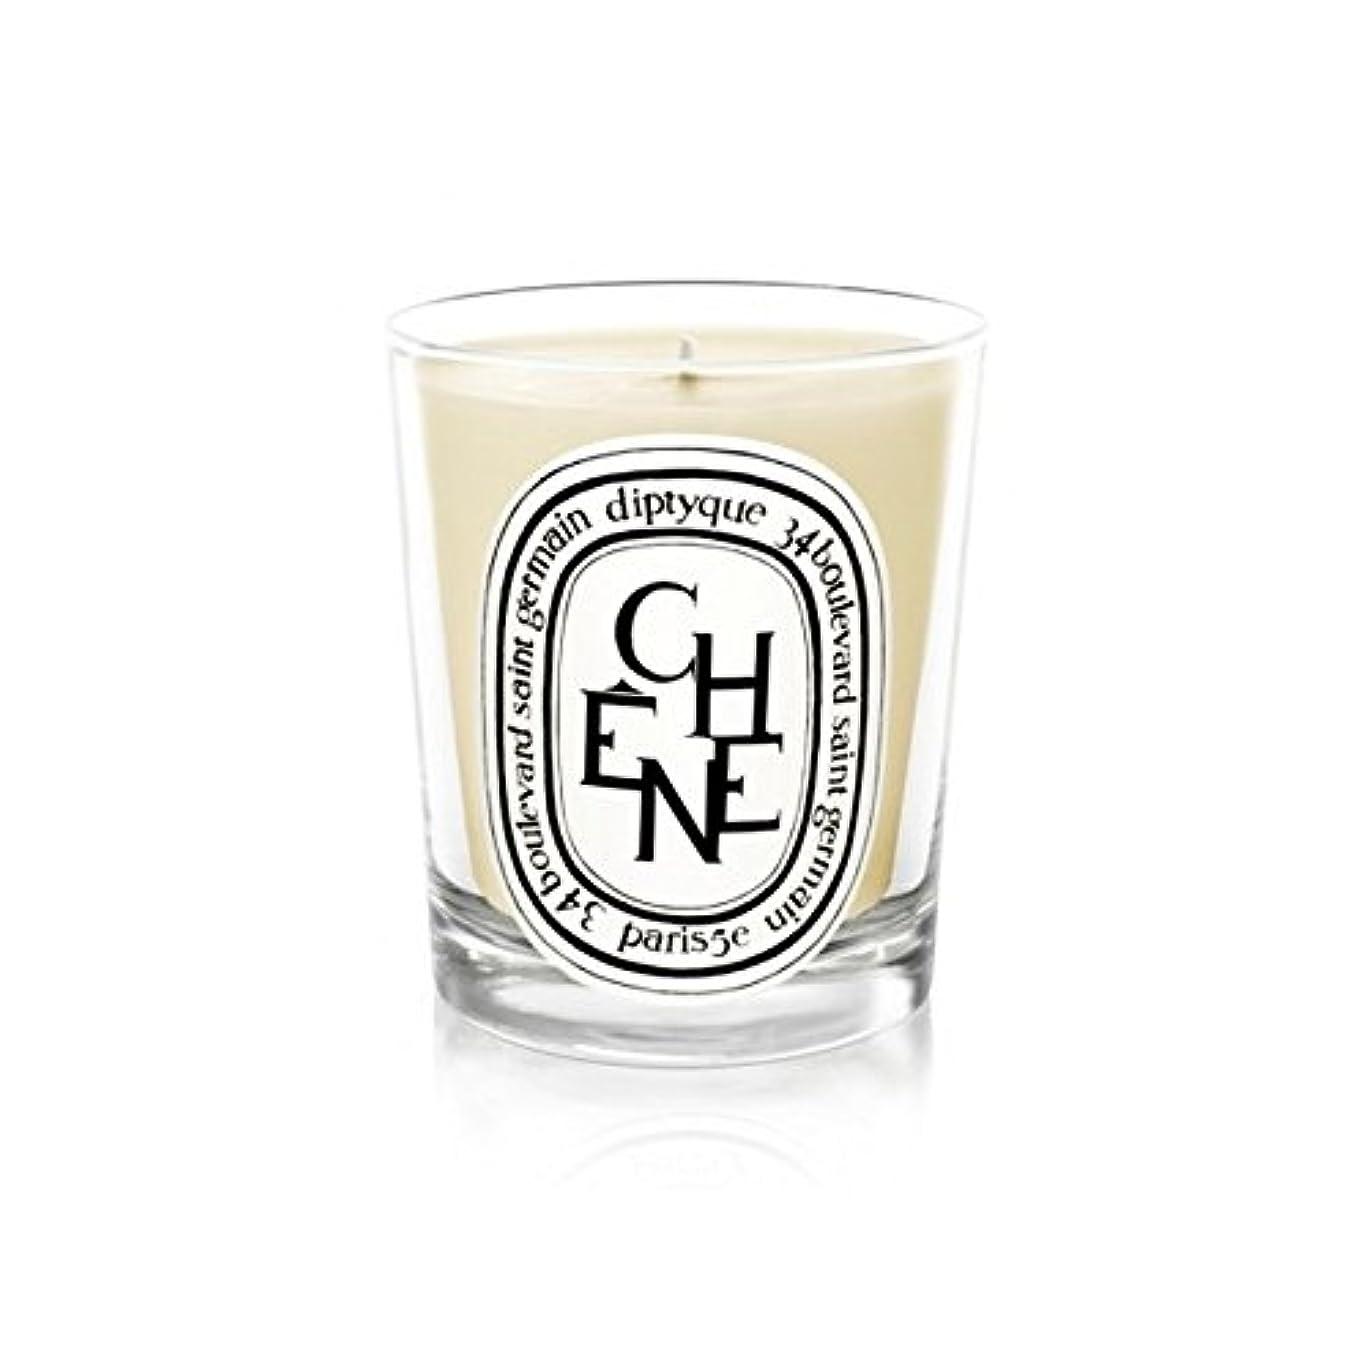 Diptyque Candle Ch??ne / Oak Tree 190g (Pack of 6) - DiptyqueキャンドルCh??Ne/樫の木の190グラム (x6) [並行輸入品]